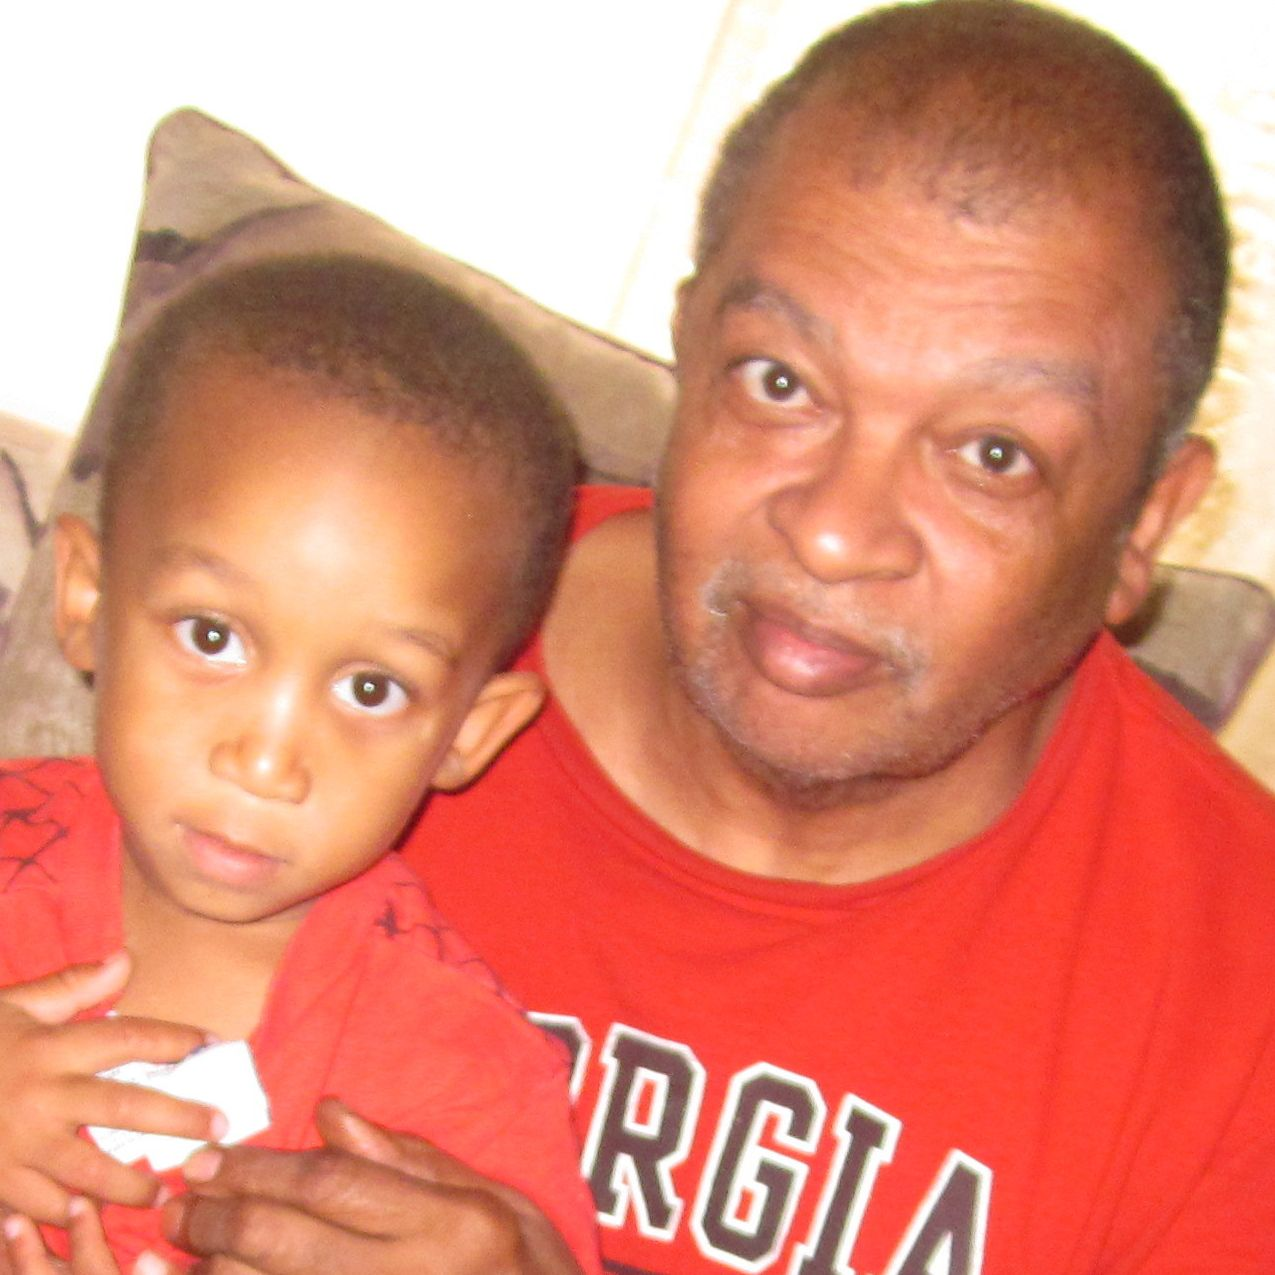 Disabled grandparents struggle to raise grandchildren in decent home